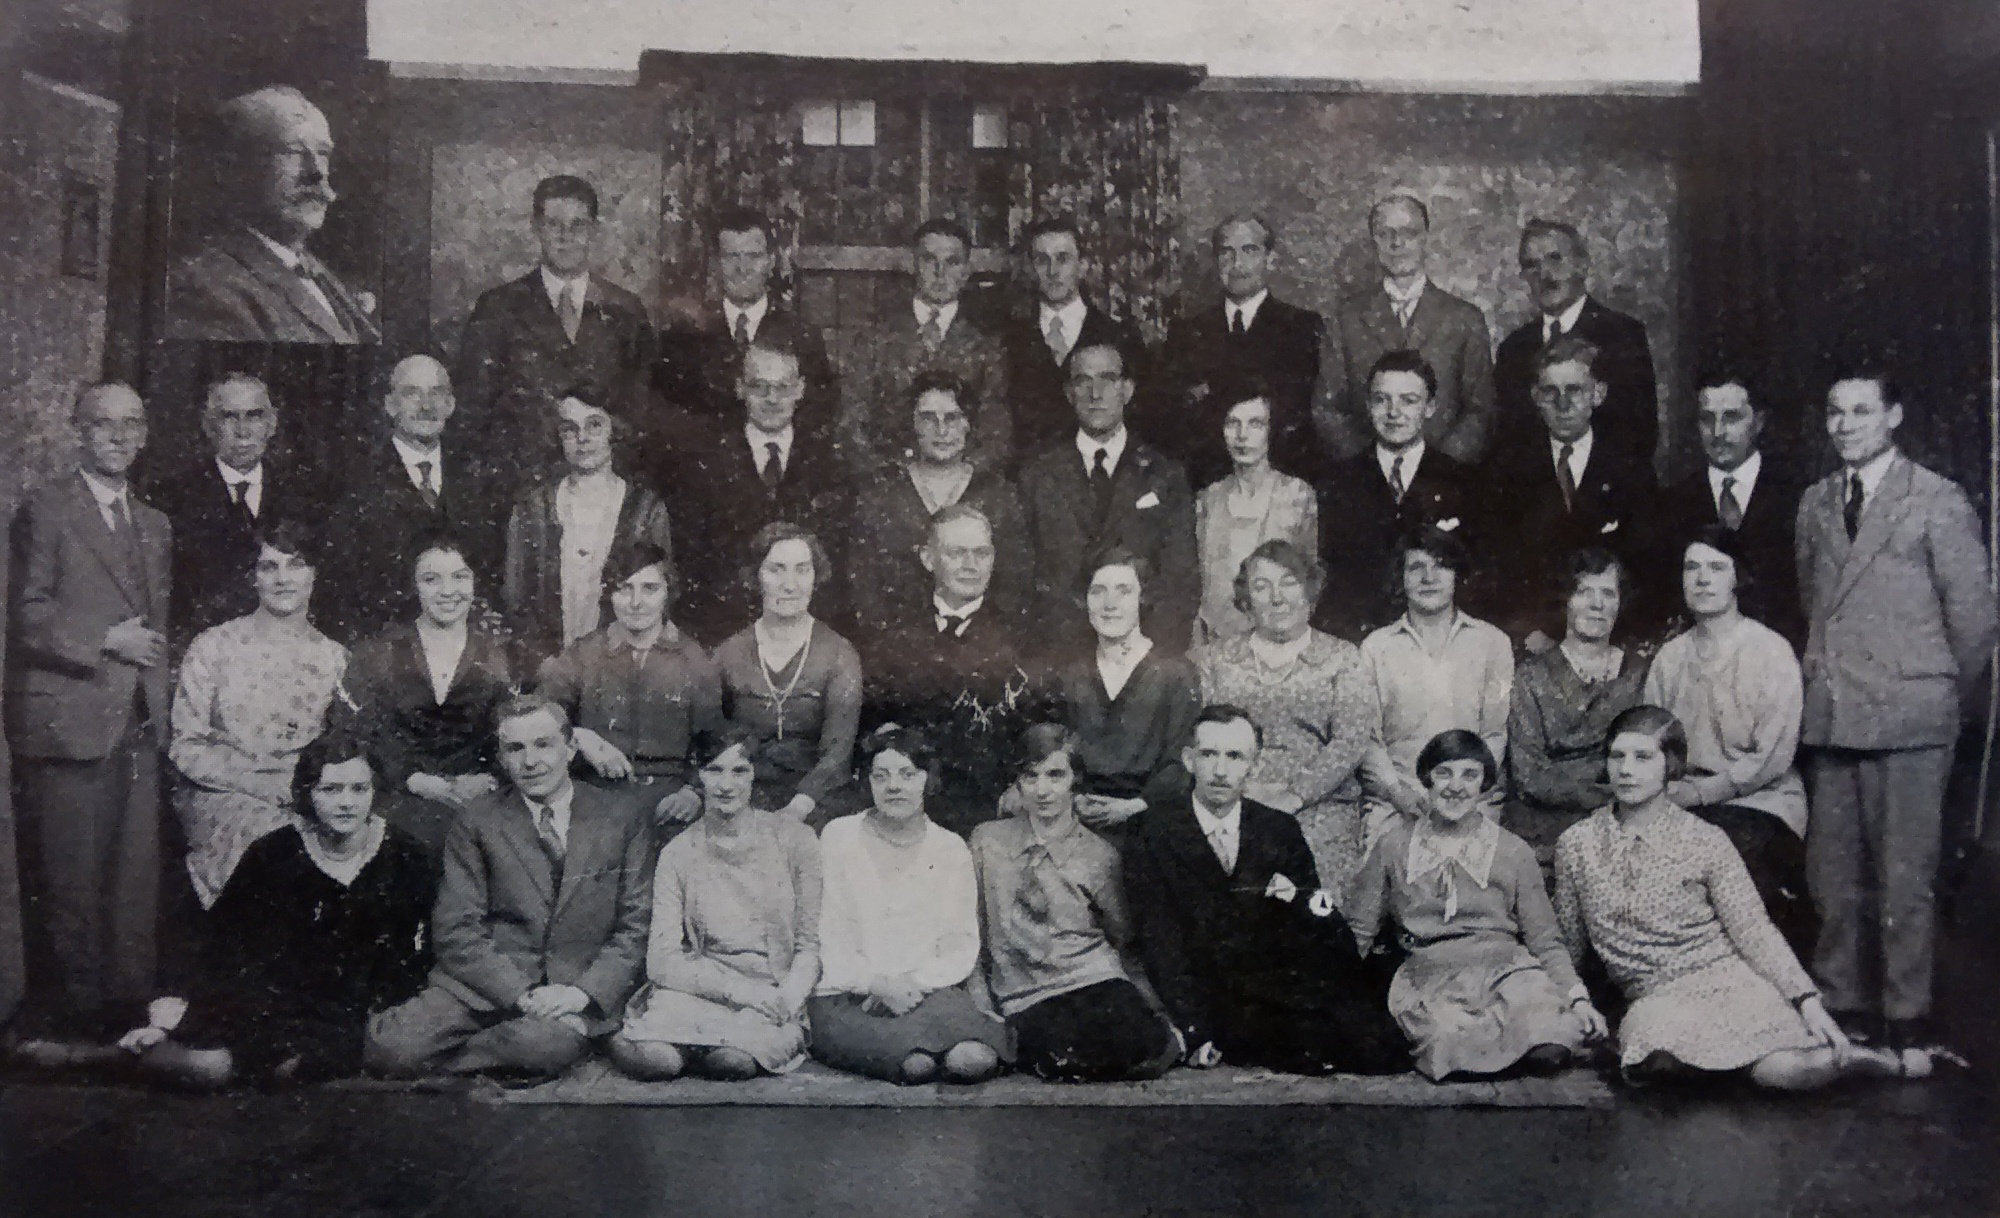 Centenary Wesleyan Church, St Saviourgate (now known as Central Methodist Church). Choir photograph taken in 1929.